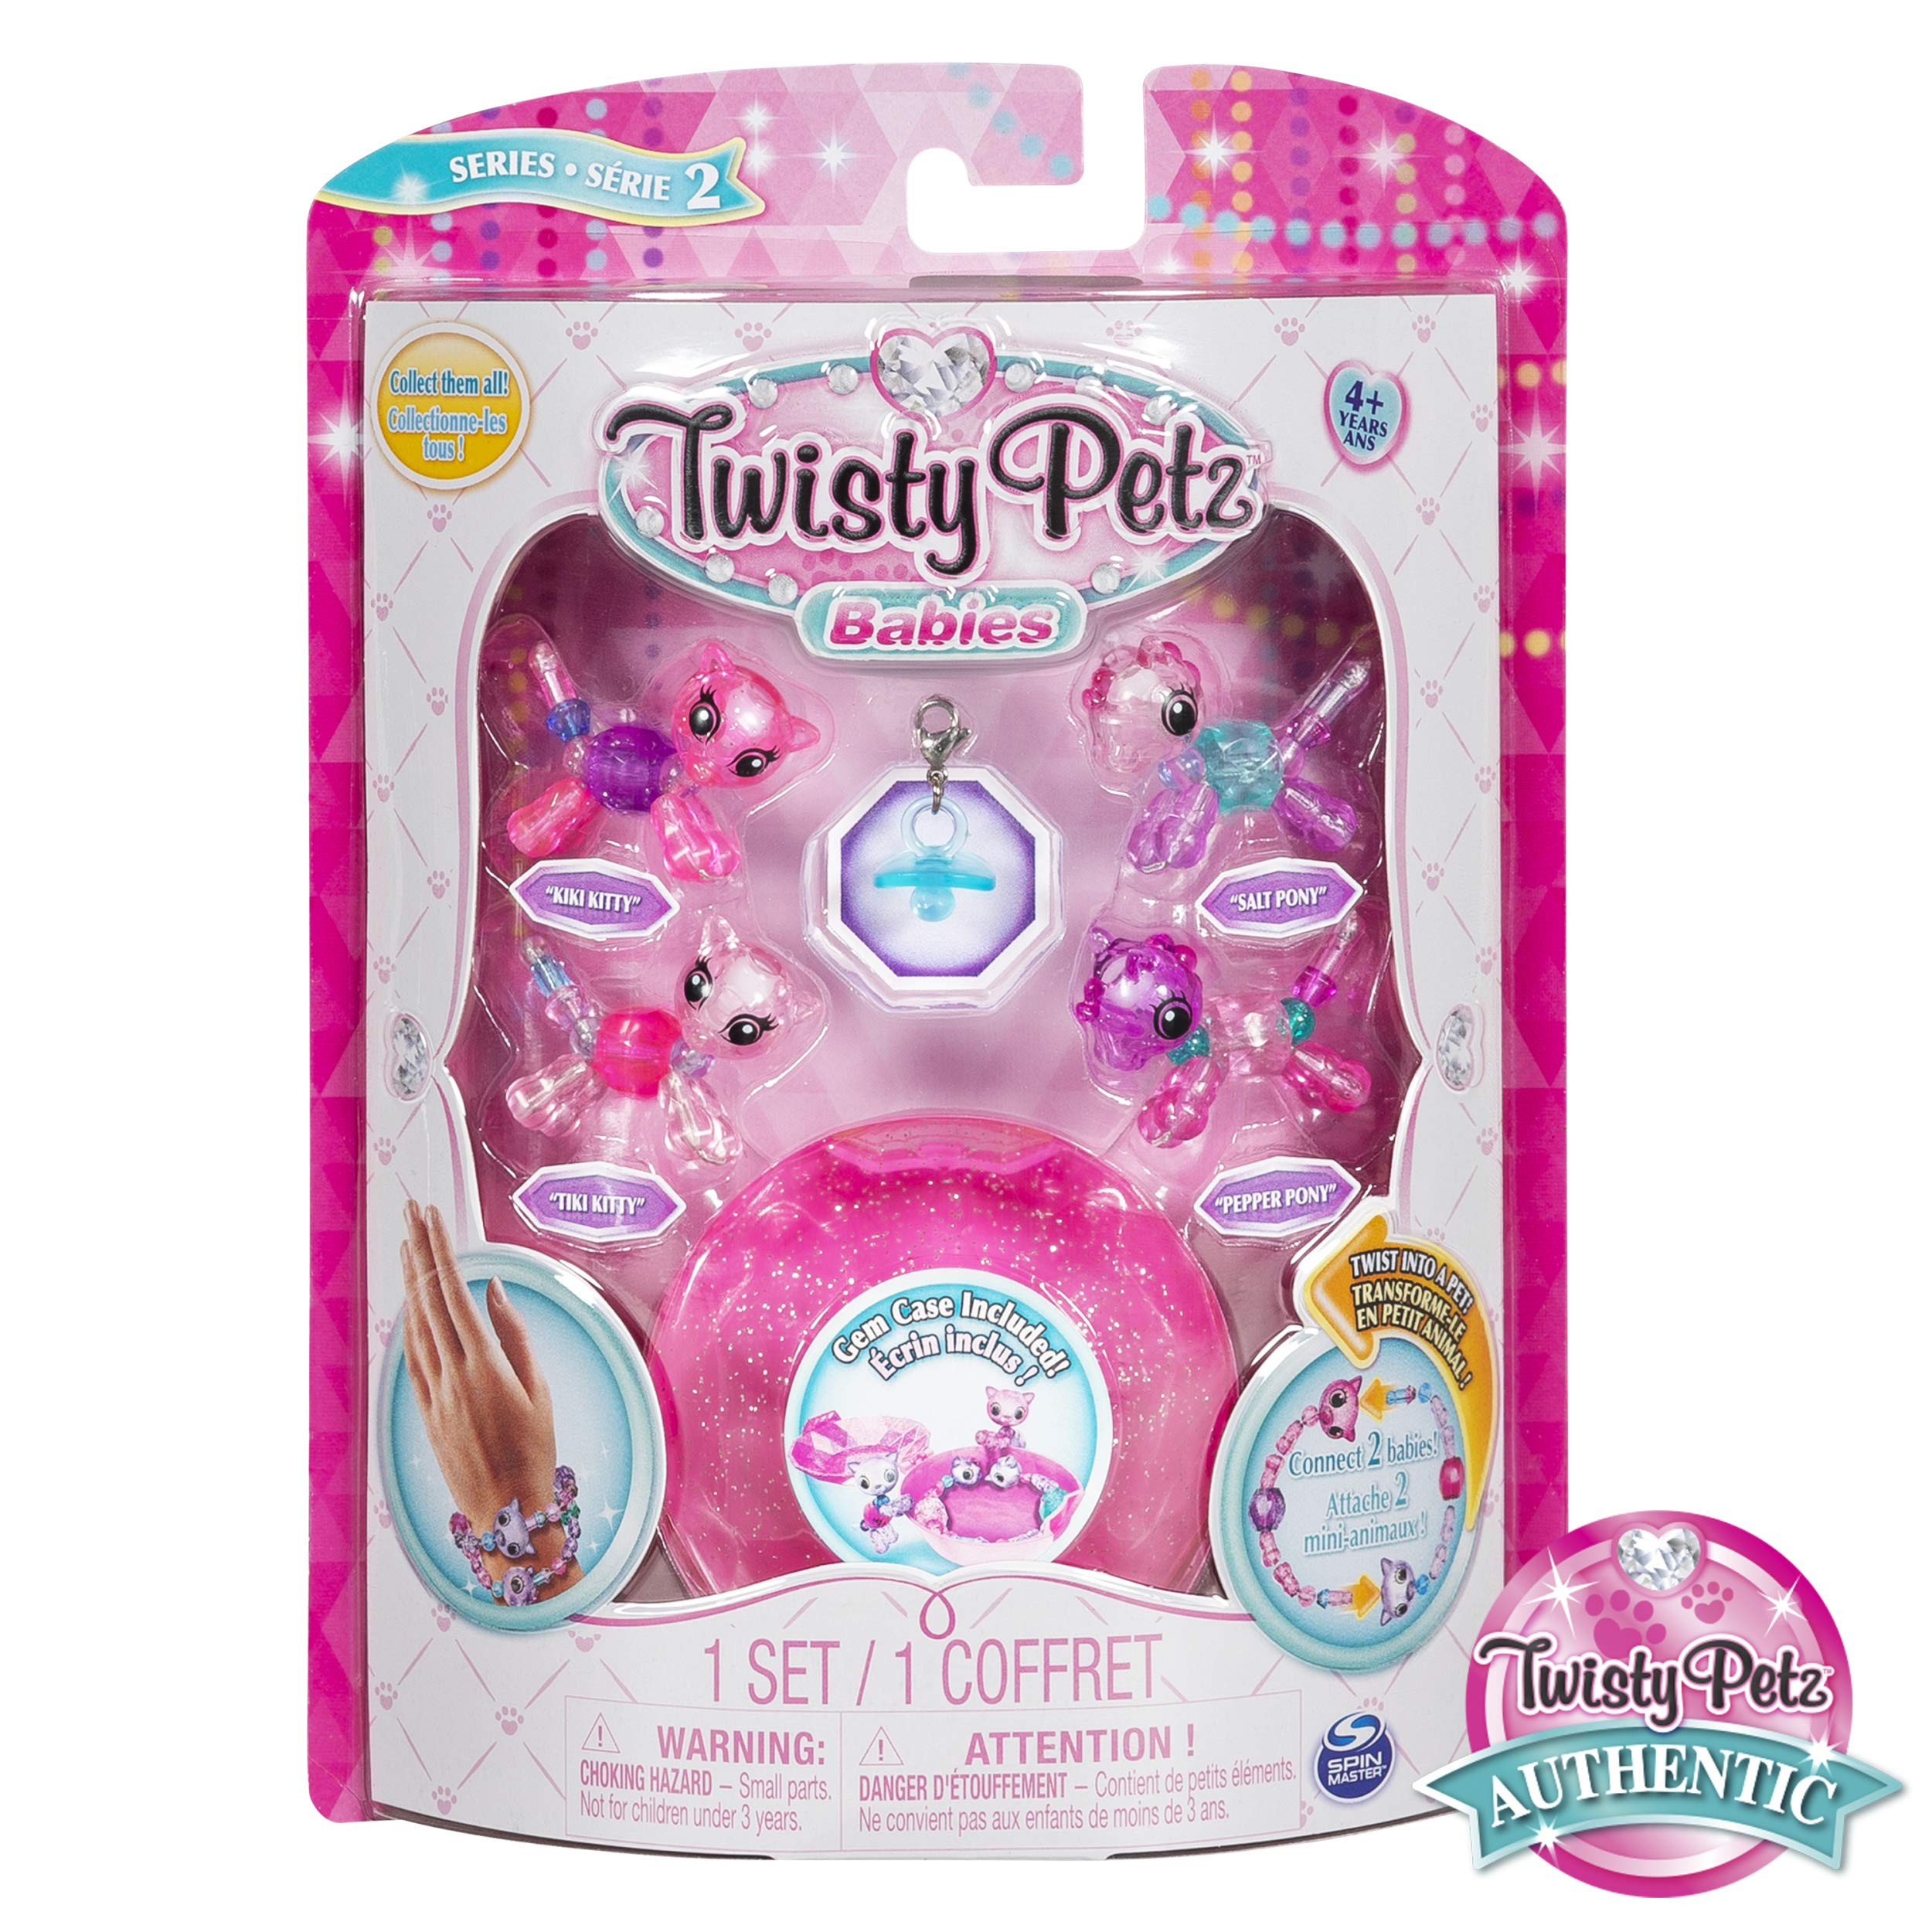 4 Pack Set Twisty Petz 6044224 Babies Glitzy Bracelets Mixed Colours